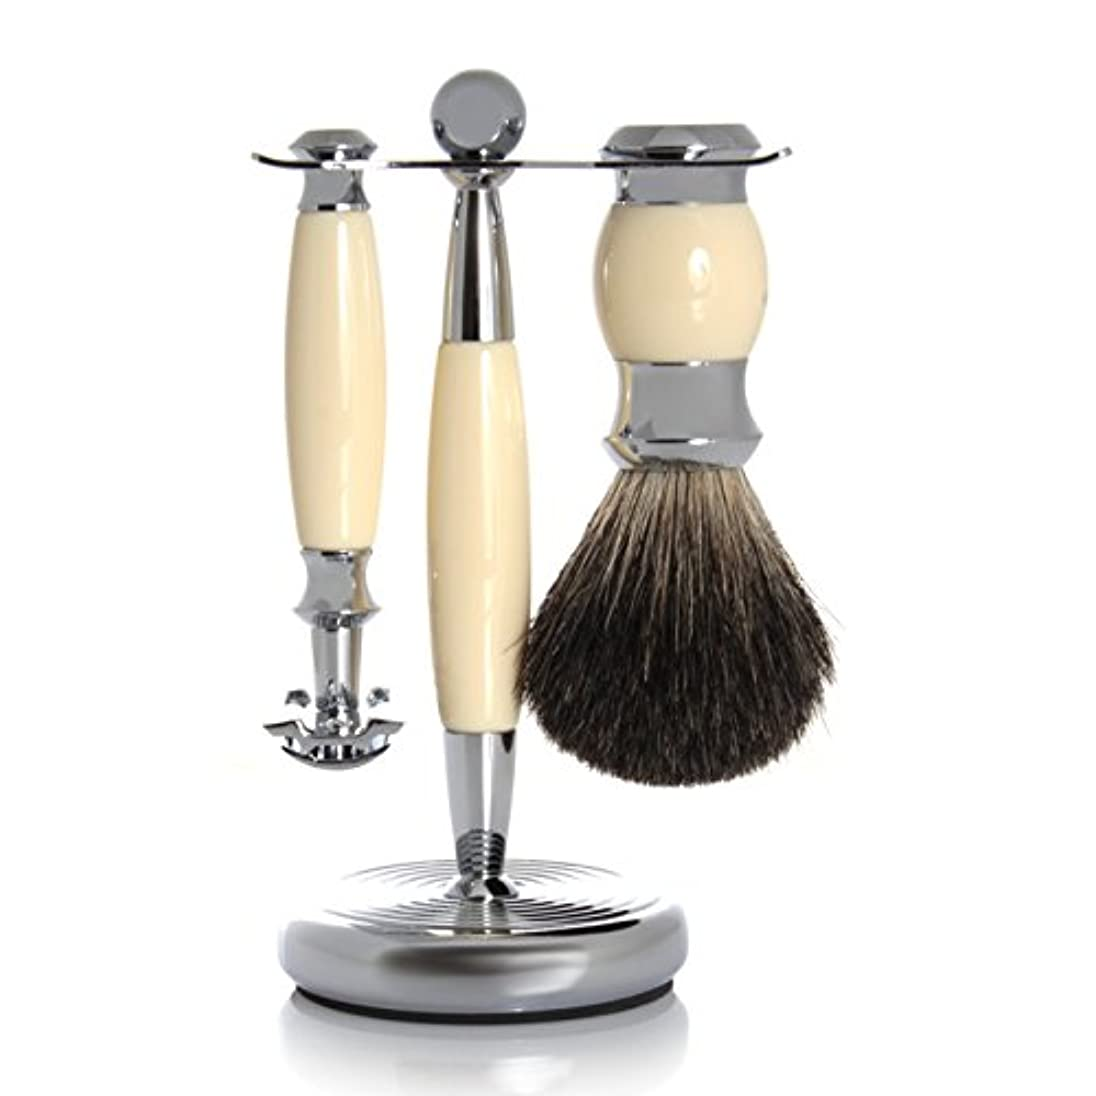 GOLDDACHS Shaving Set, Safety Razor, 100% badger hair, white/silver